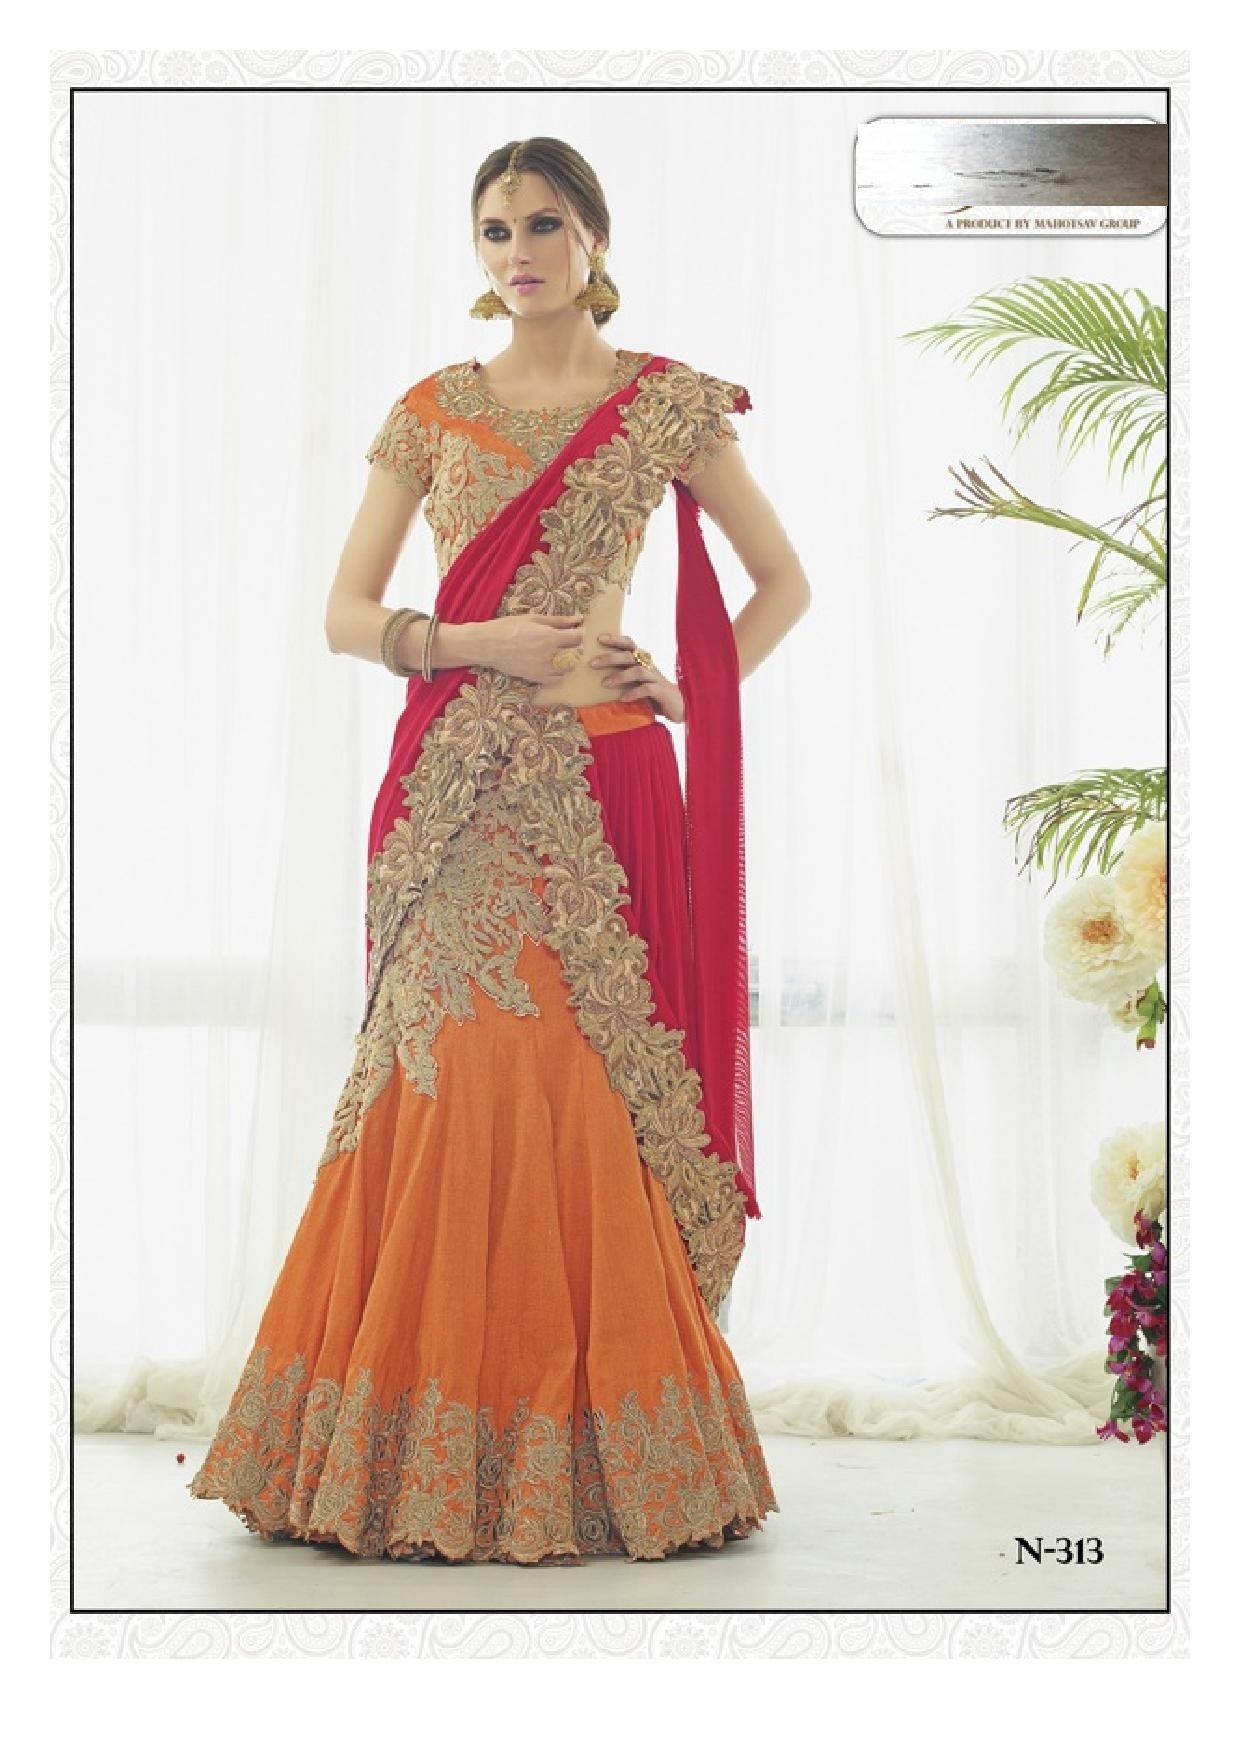 Bollywood Women Lehenga Choli Dupatta Ceremony Bridal Wedding Women Blouse Collection 617 13 by SHRI BALAJI SILK & COTTON SAREE EMPORIUM (Image #2)